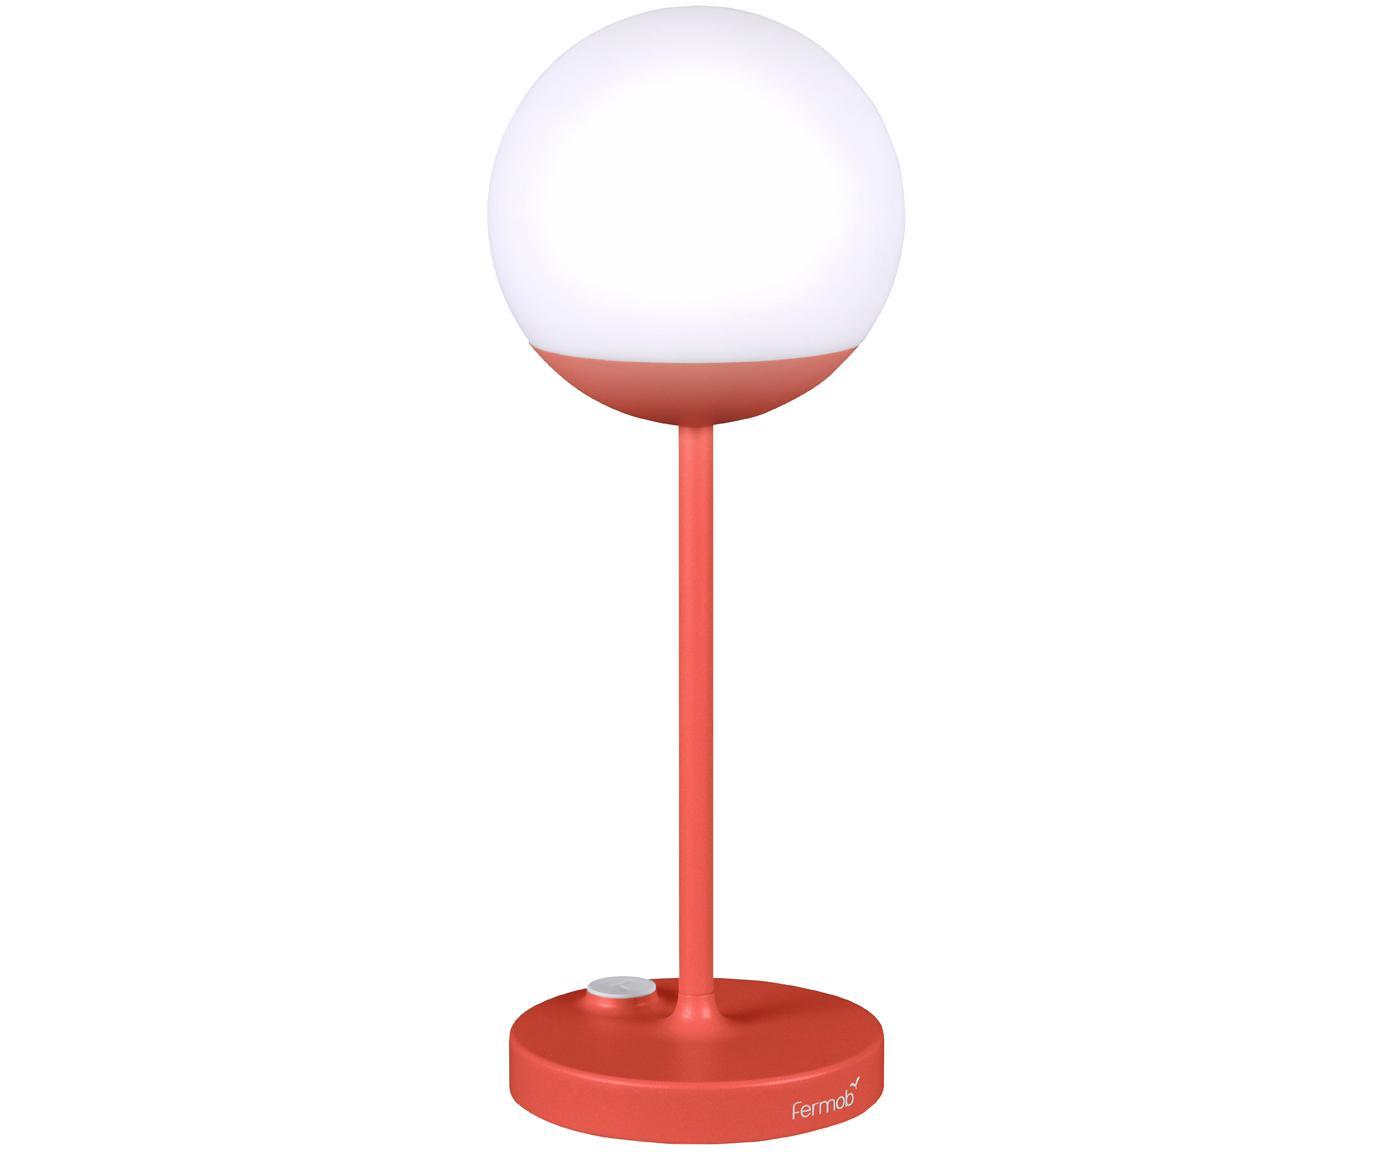 Mobile LED Aussenleuchte Mooon, Lampenschirm: Kunststoff, Rot, Ø 15 x H 41 cm